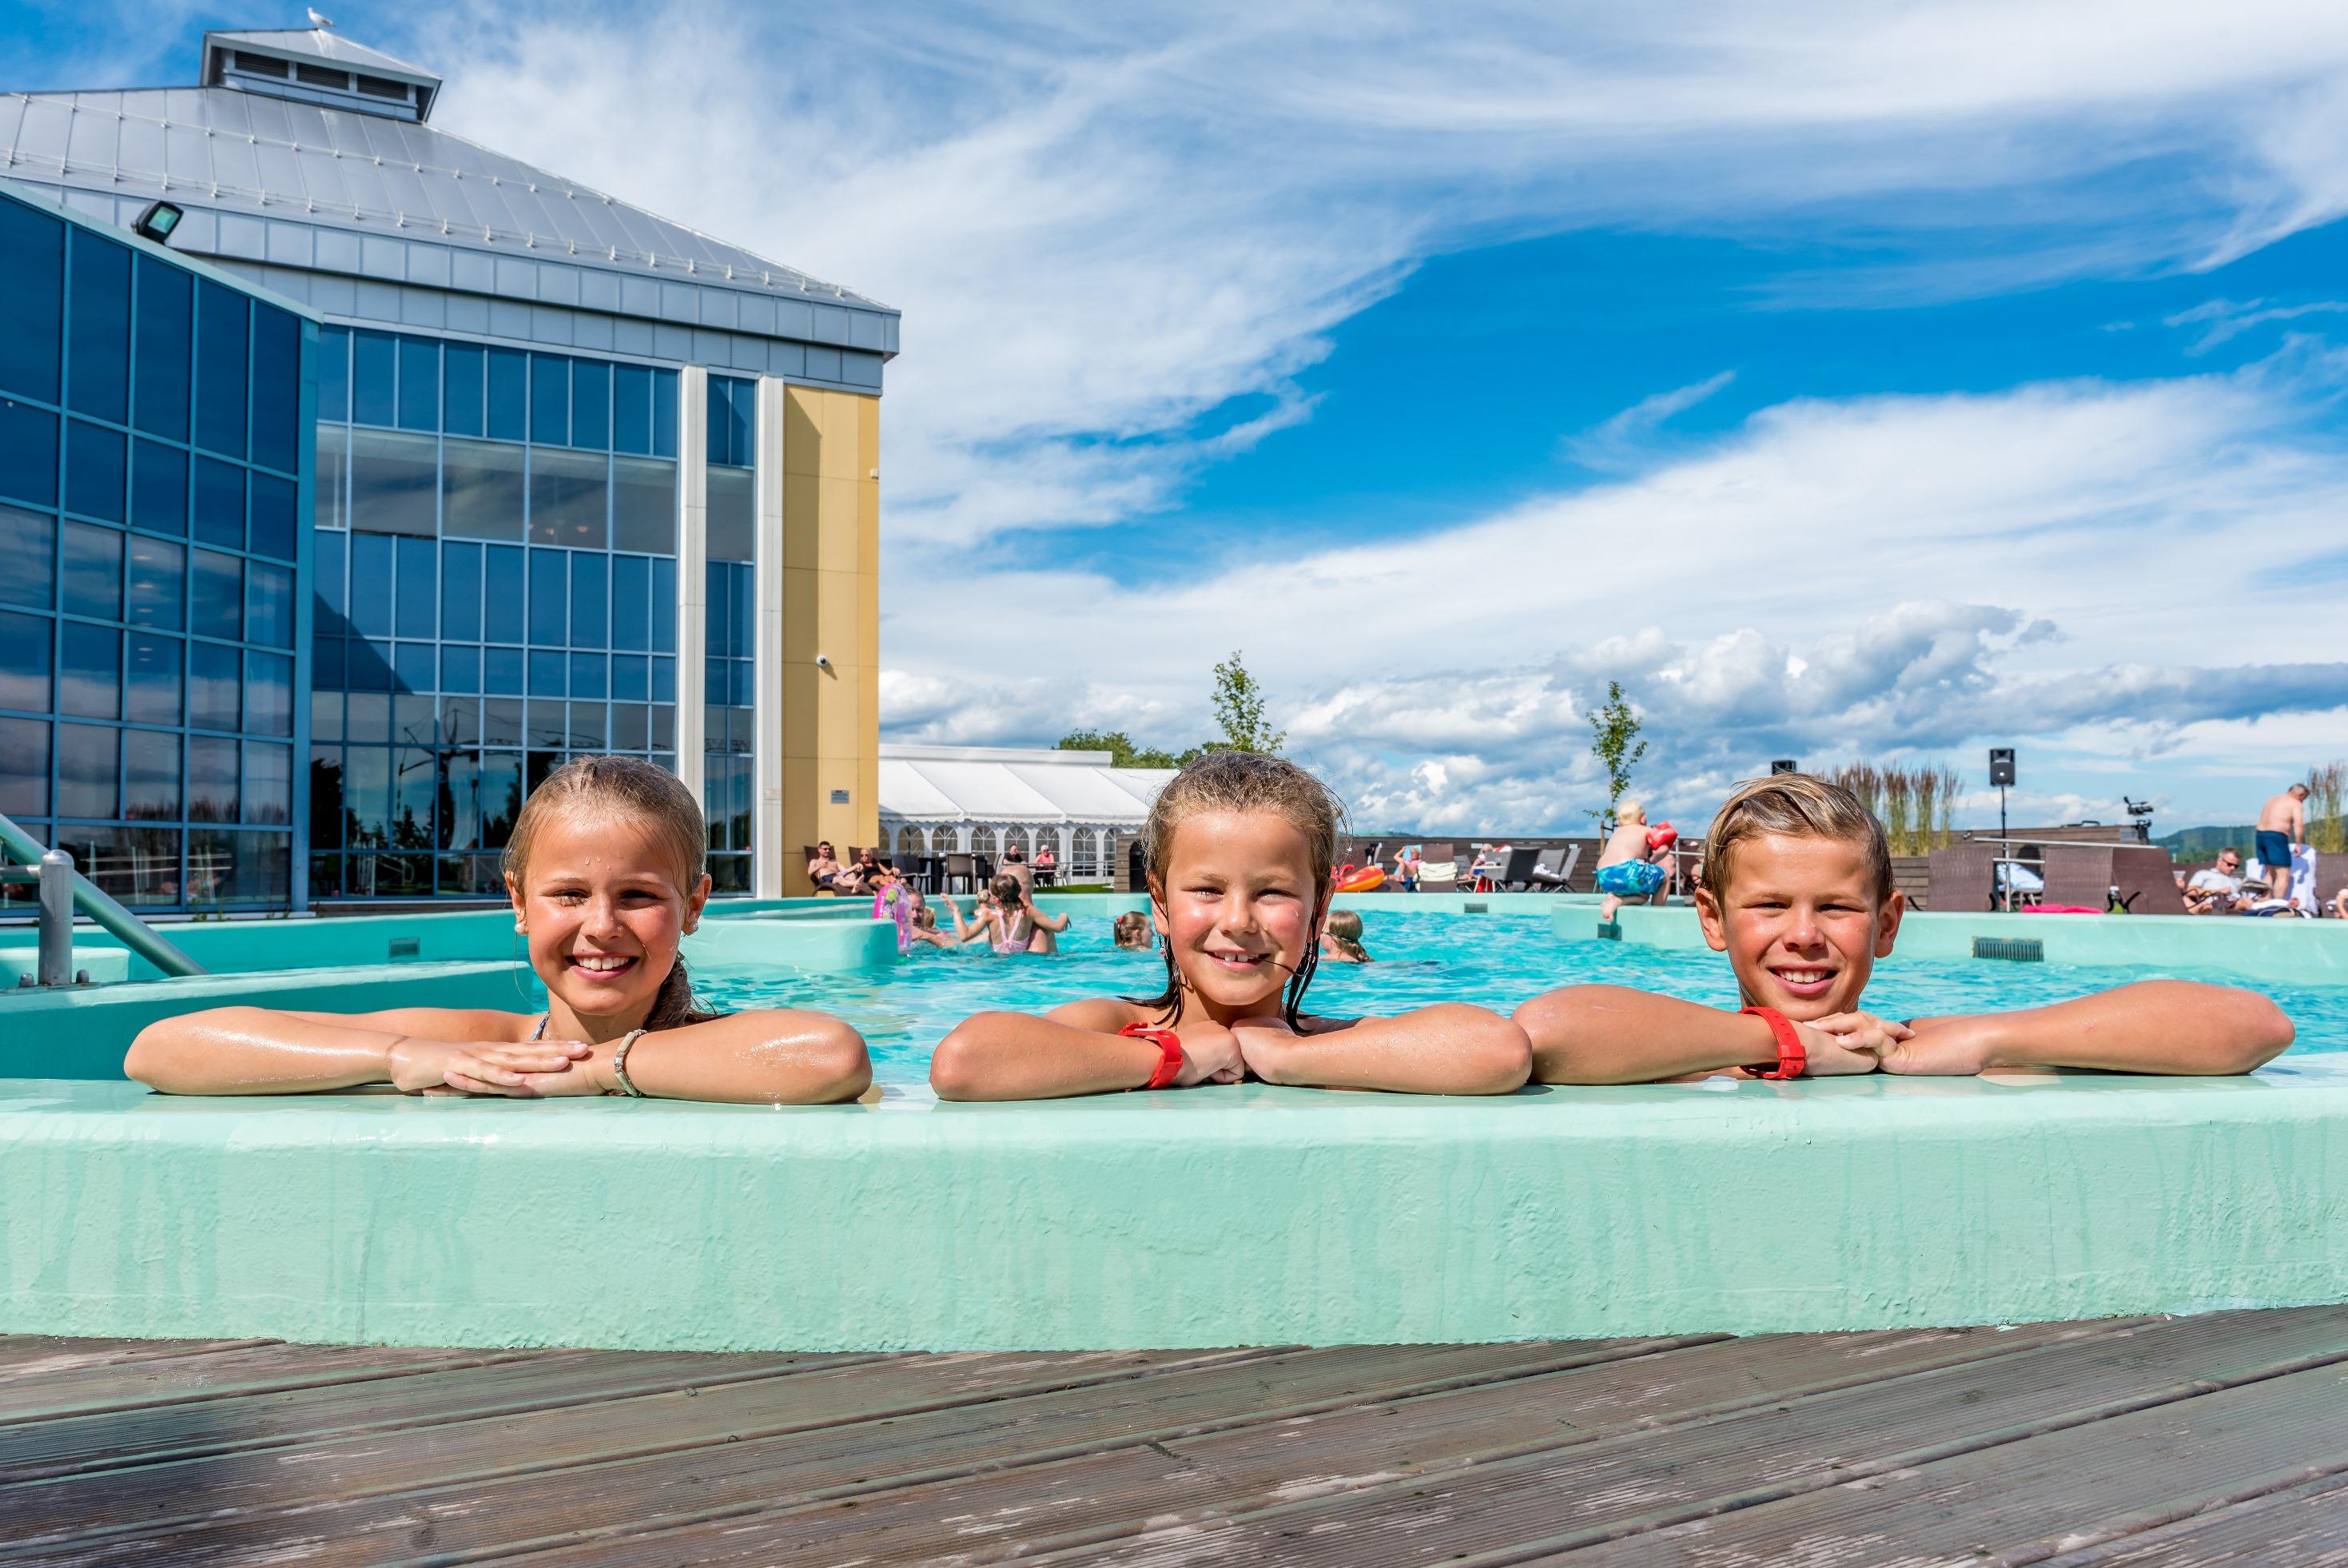 Badeparken i Lamgesund på Quality Hotel Skjærgården. Her kam man bade både inne og ute året rundt. Foto: Sigurd Svela